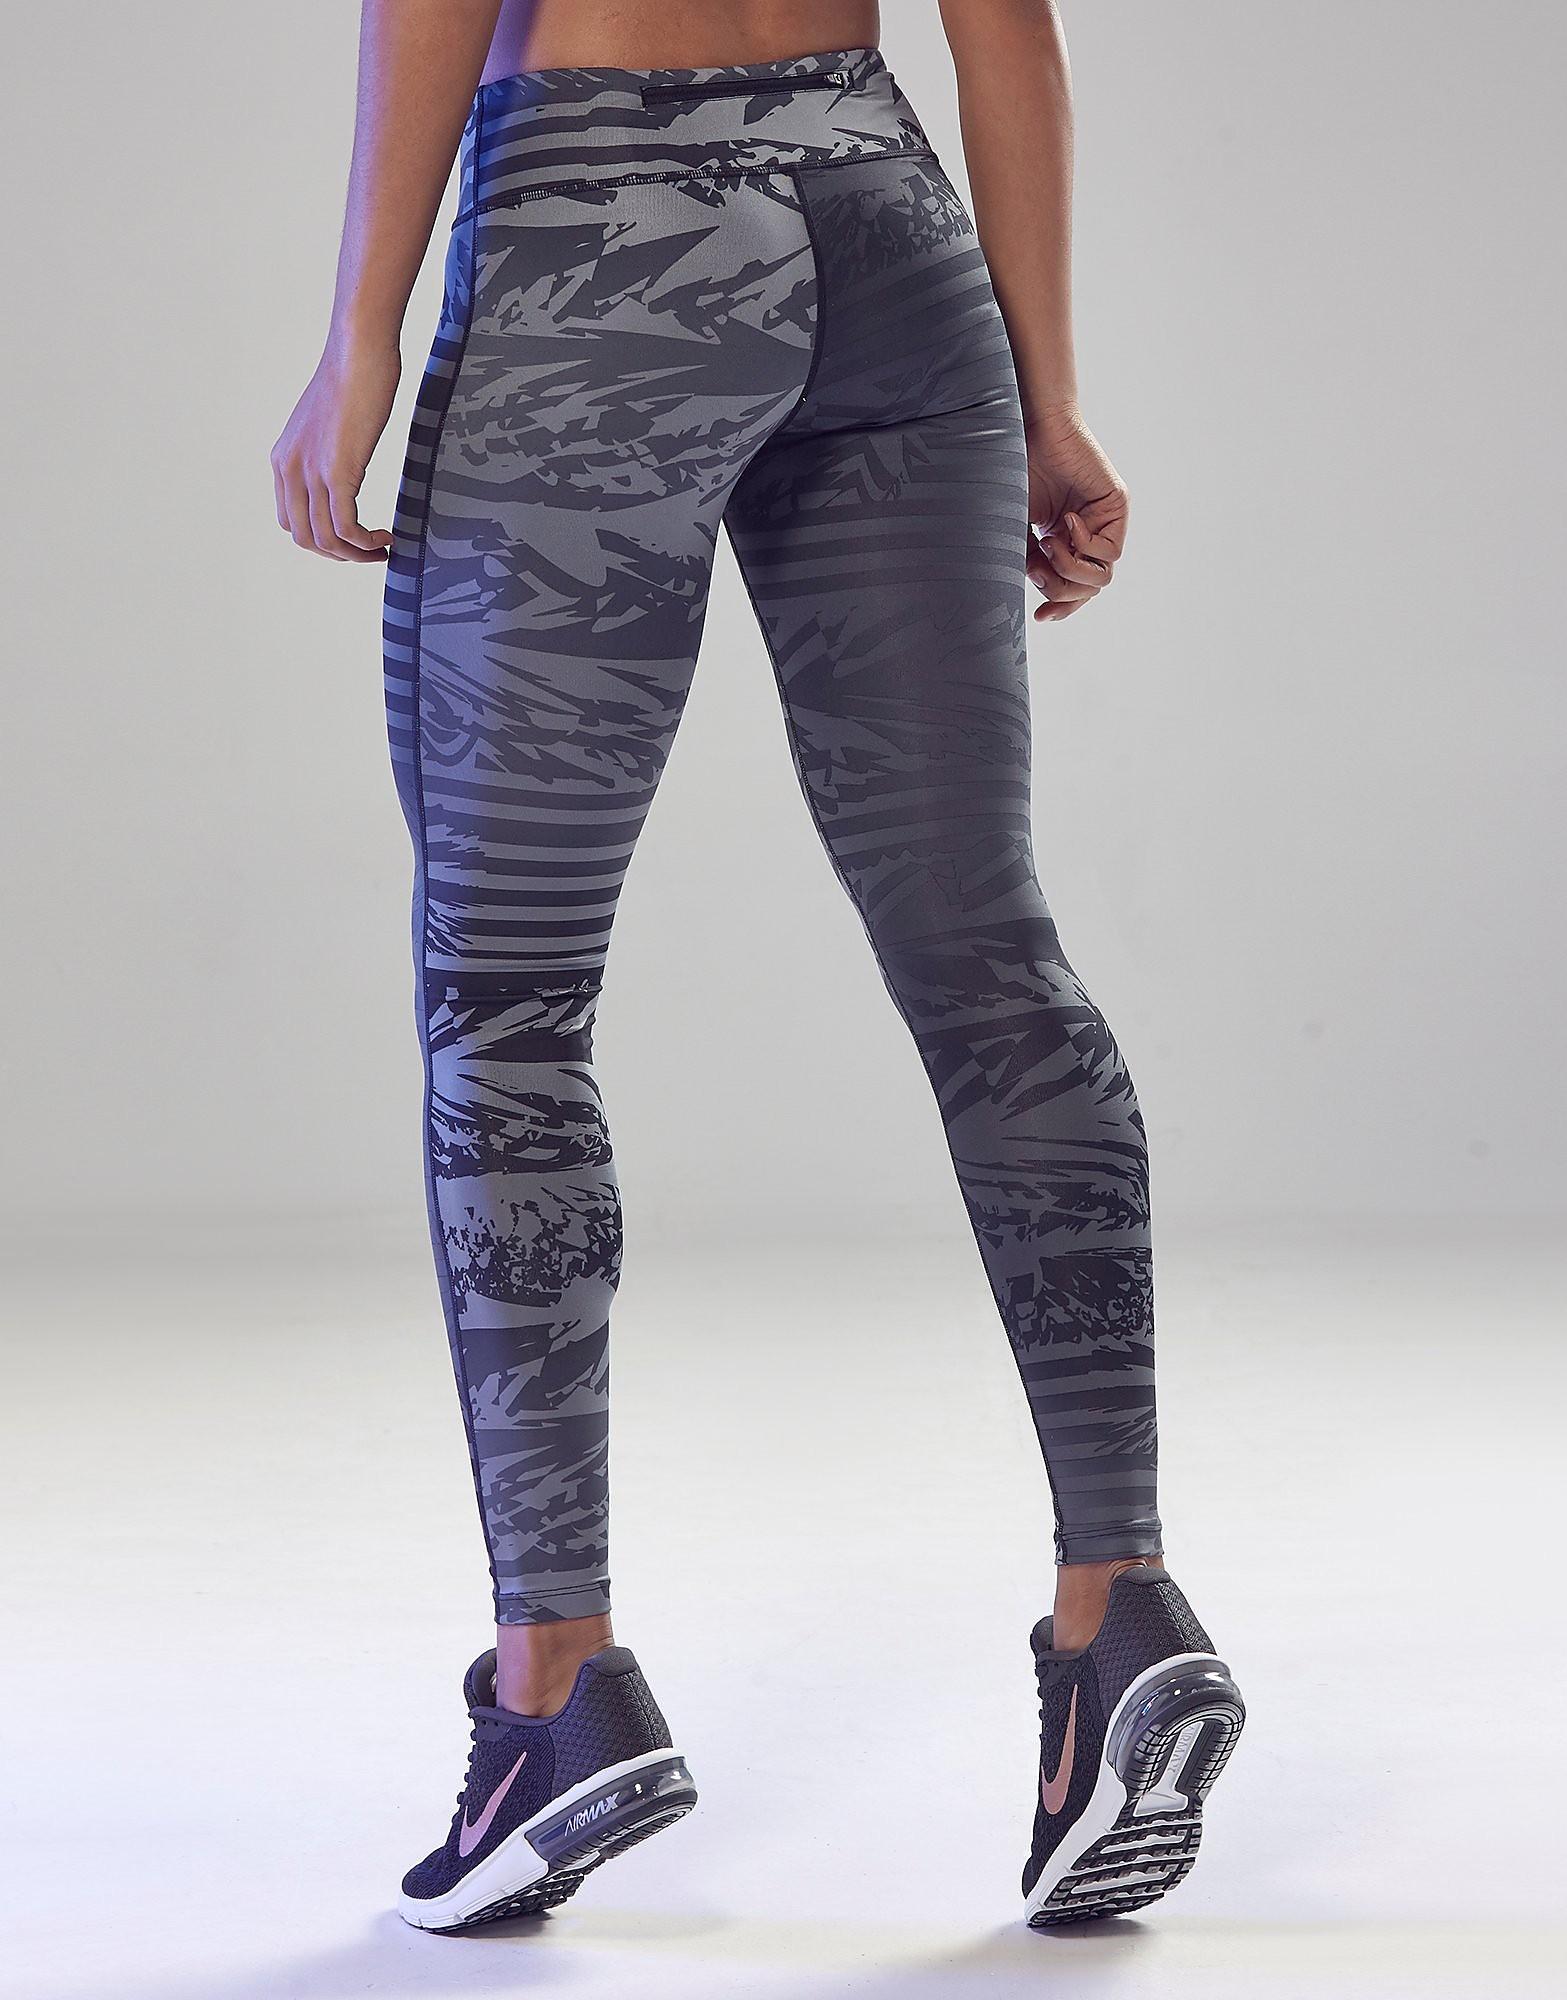 Nike Print Essentials Running Tights